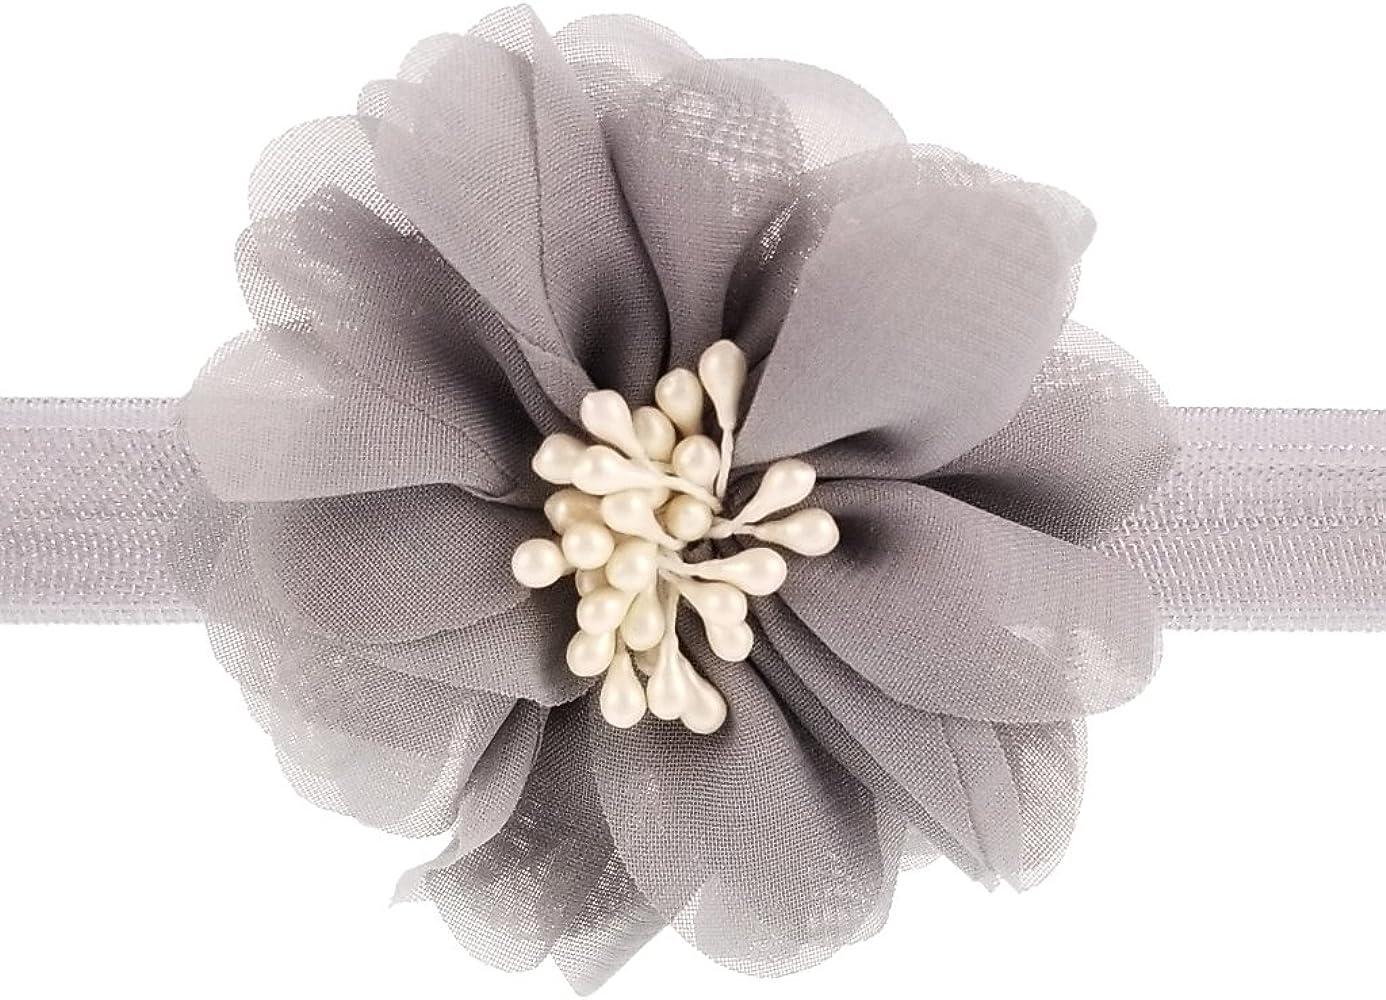 Grey Arrow /& Rhinestone Boutique Flower Headband Bright Blue Canary Yellow Fuchsia 13.5 inches Normally Fits NB-6M